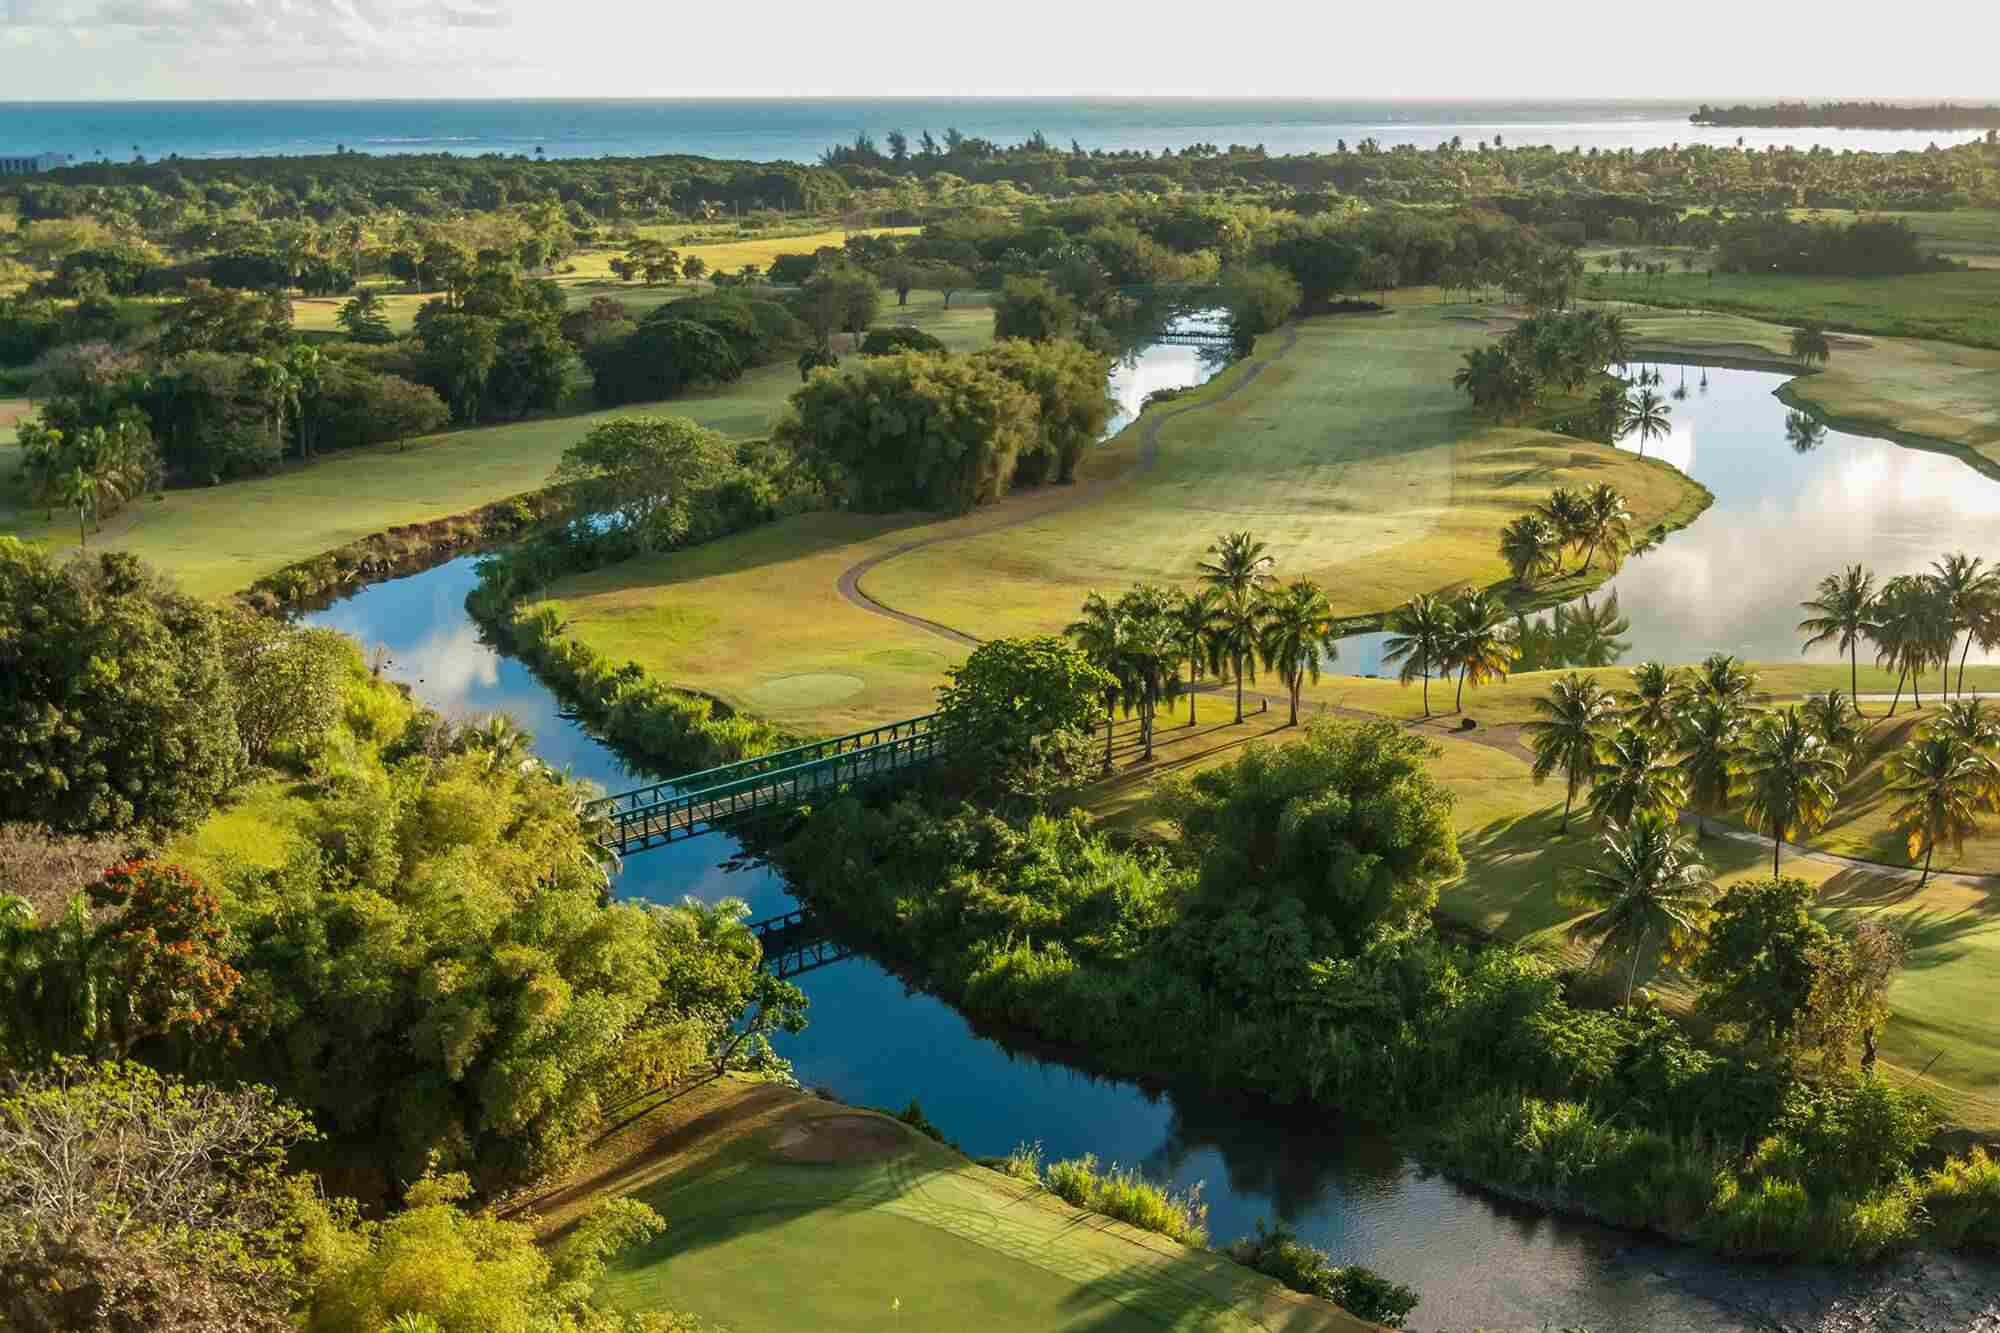 Aerial view of the Wyndham Grand Rio Puerto Rico Golf & Beach Resort